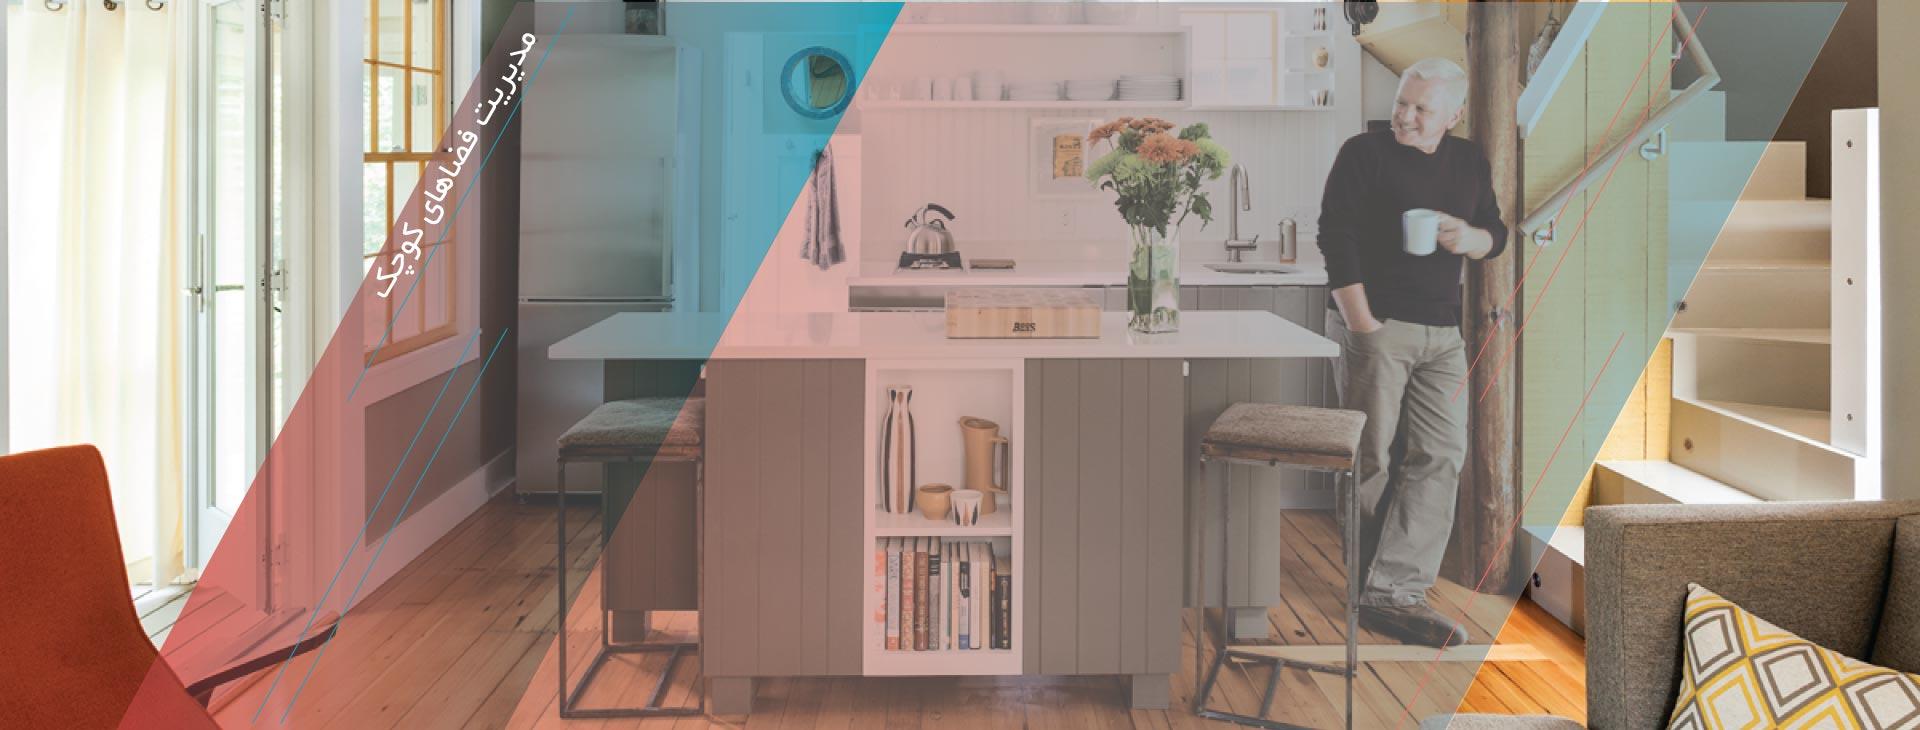 interior design for small spaces - مدیریت فضاهای کوچک